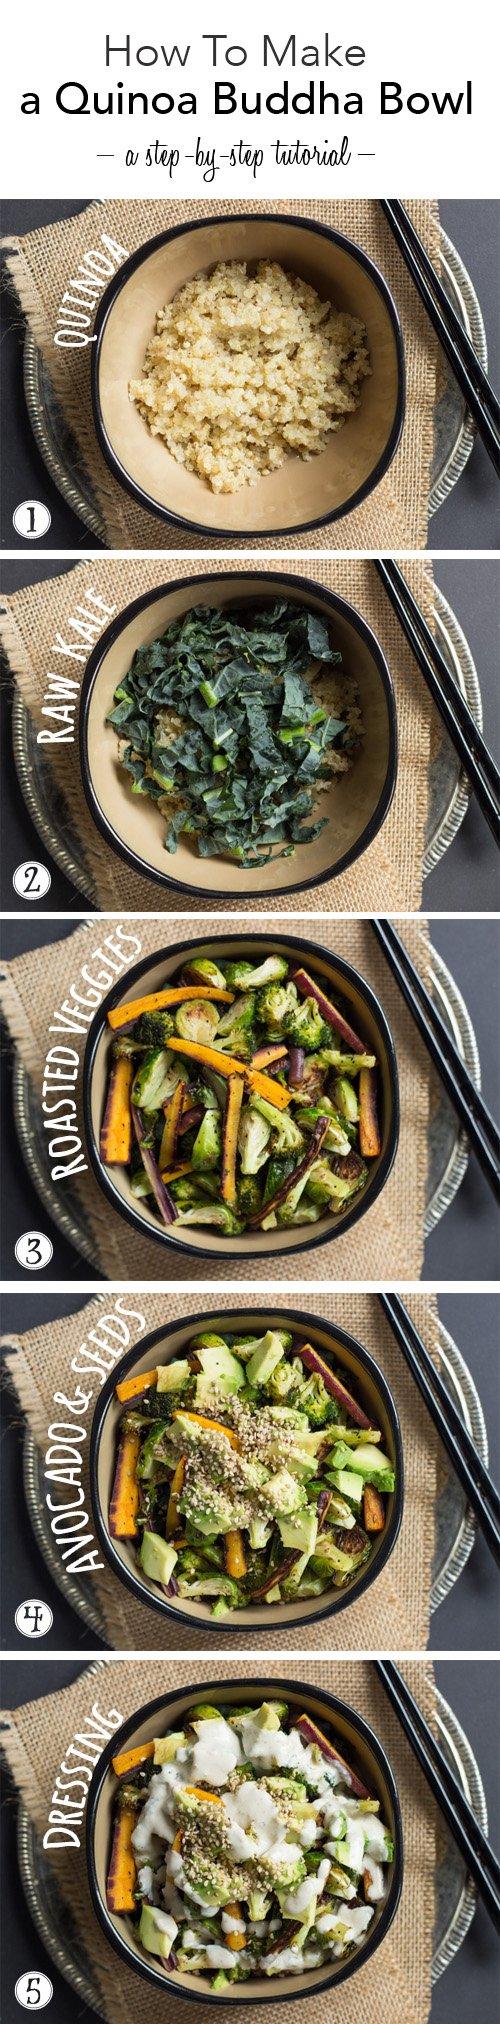 How to make the perfect quinoa buddha bowl recipe {+ a step-by-step tutorial!}